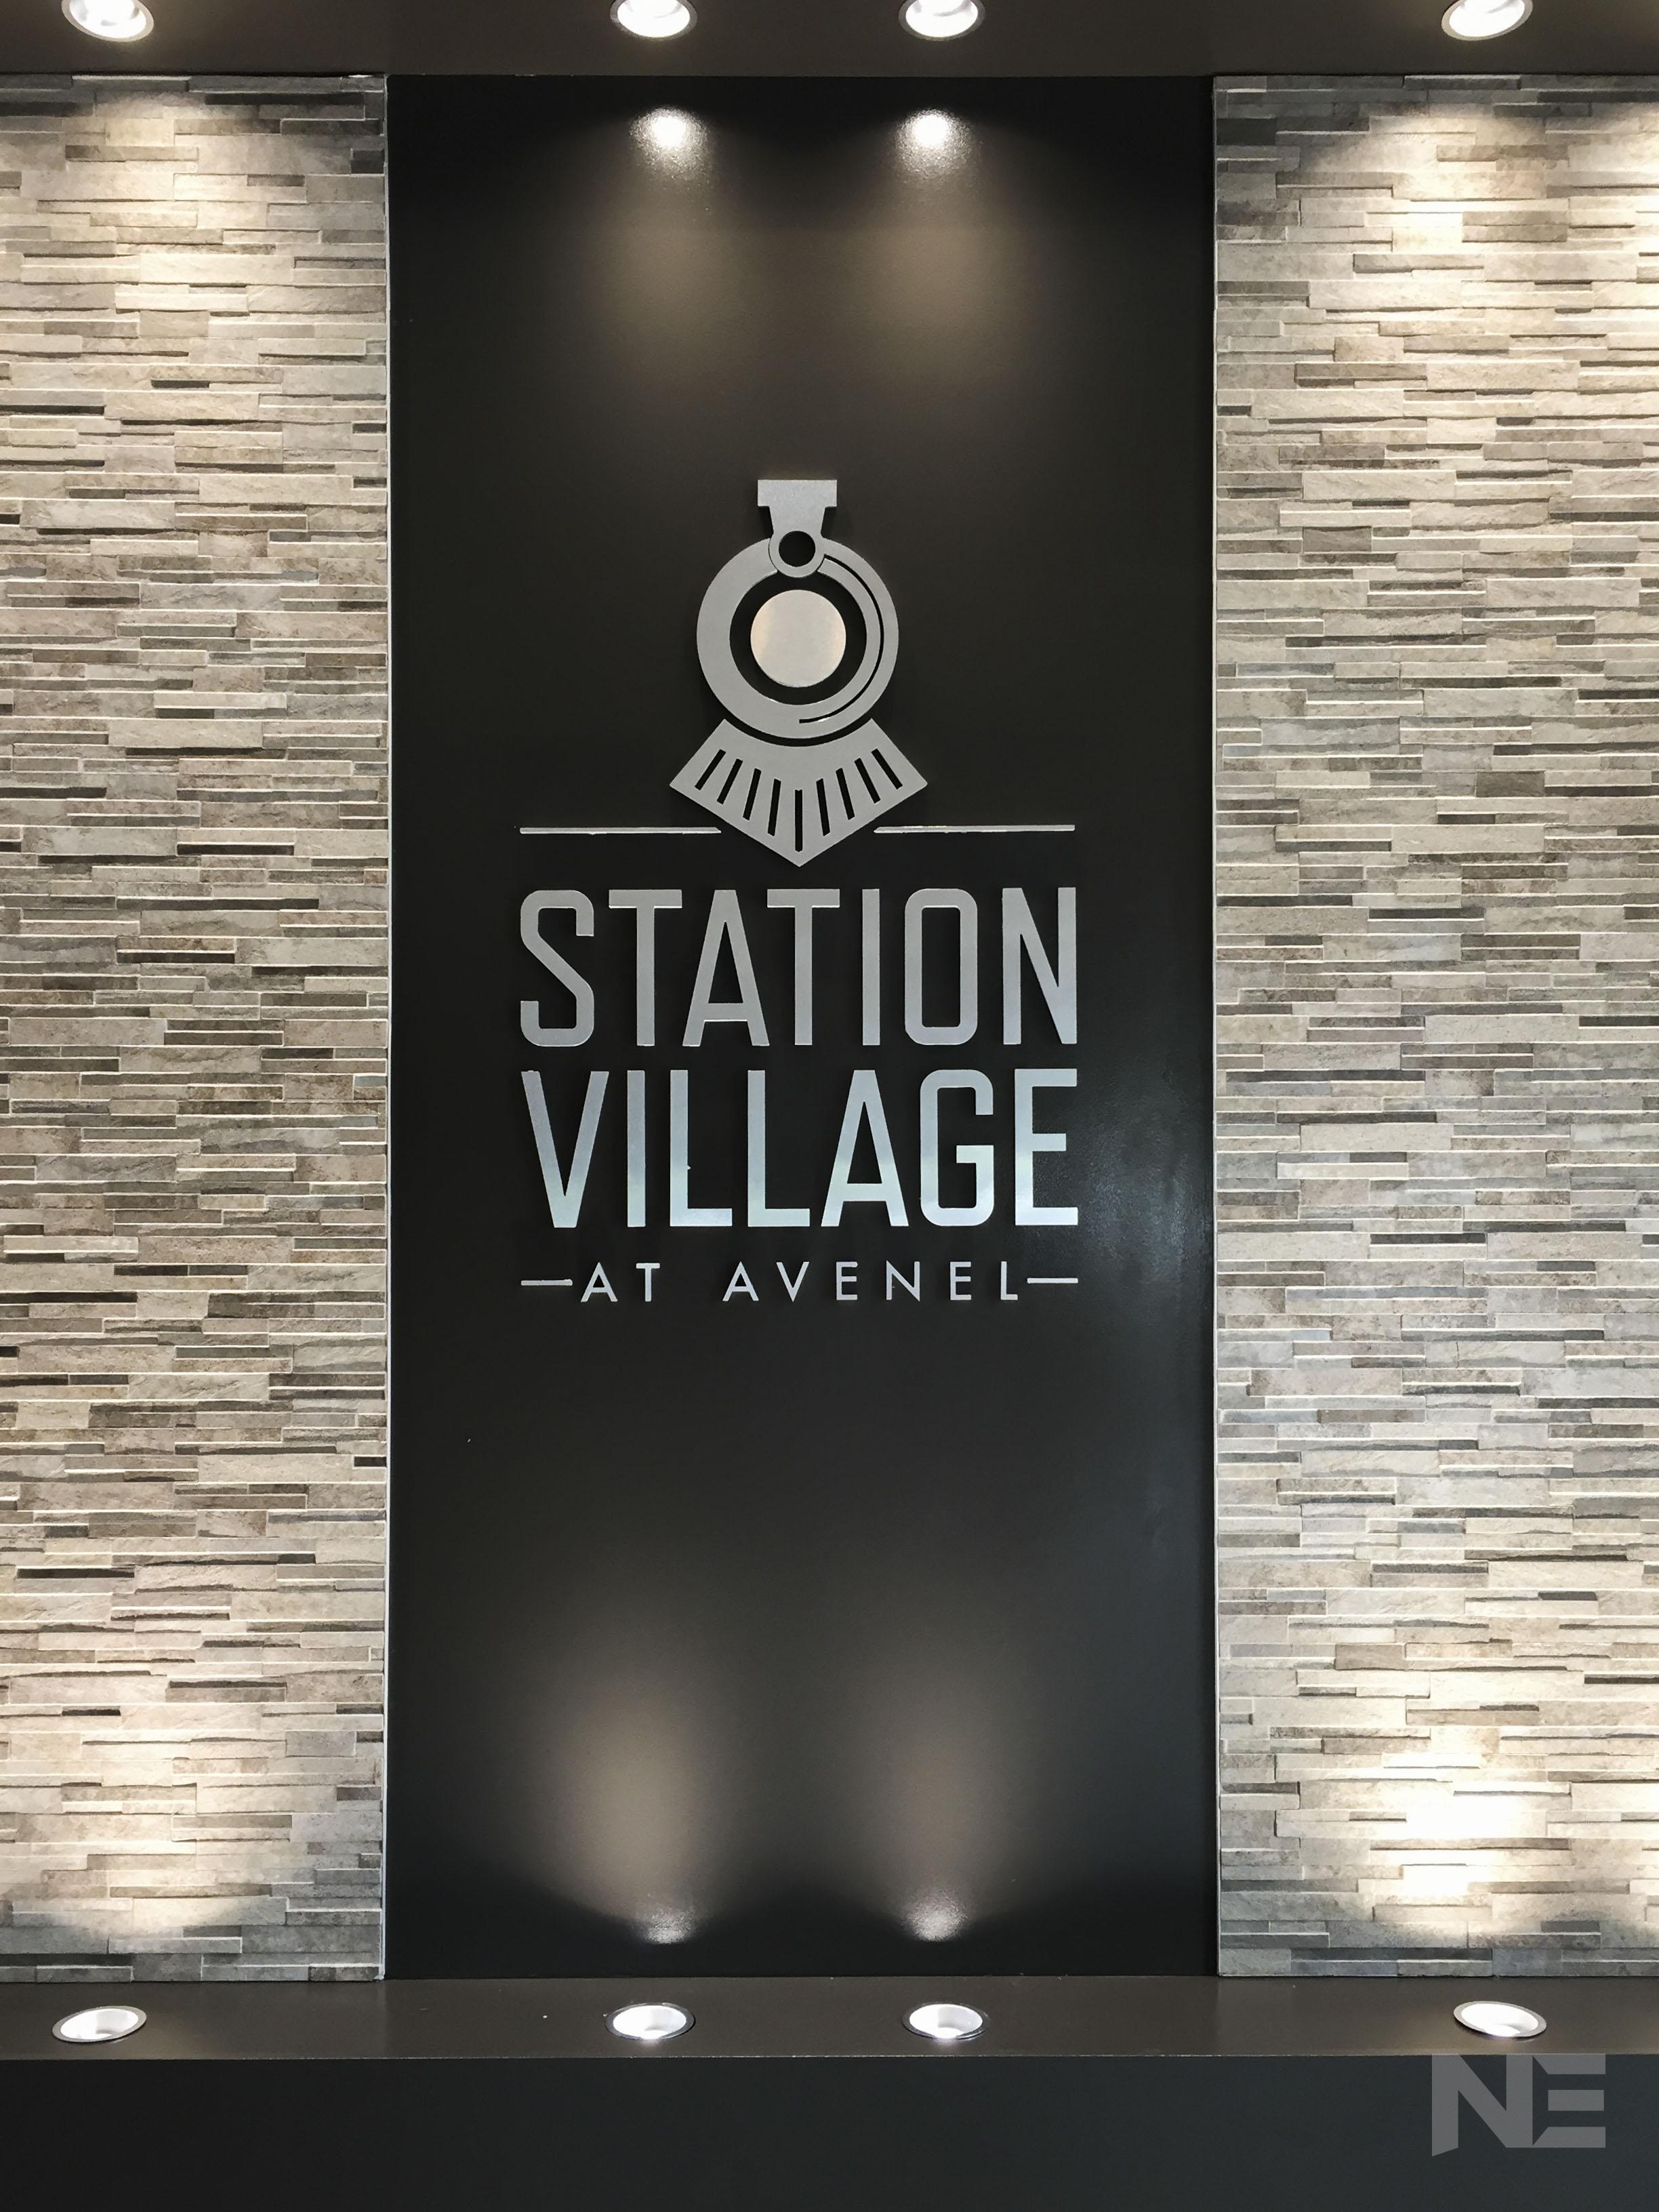 Station Village